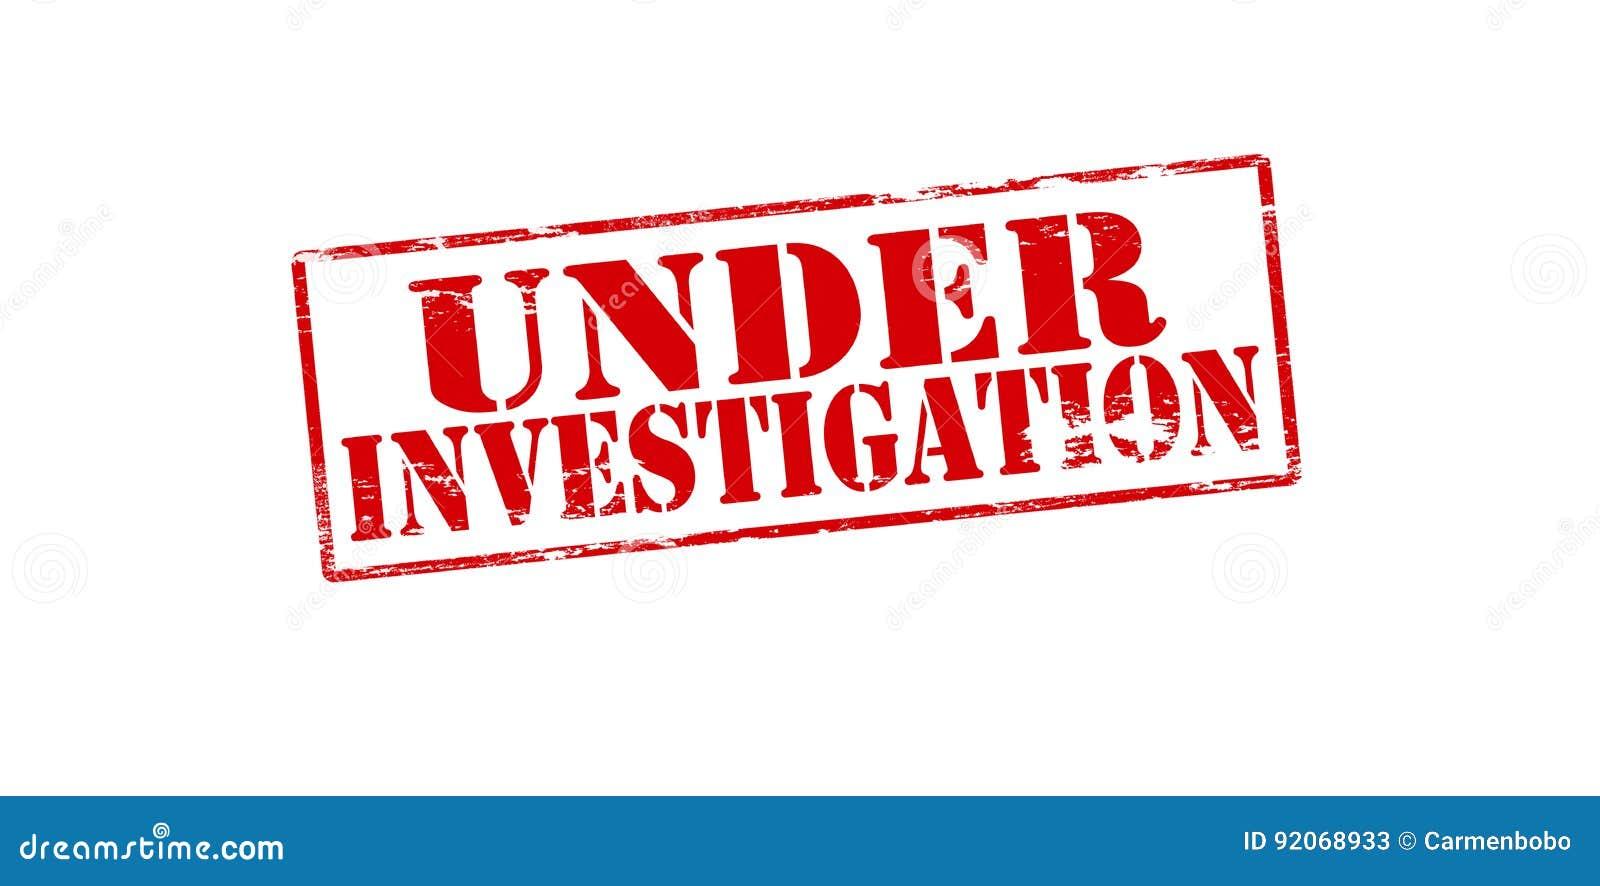 Under utredning